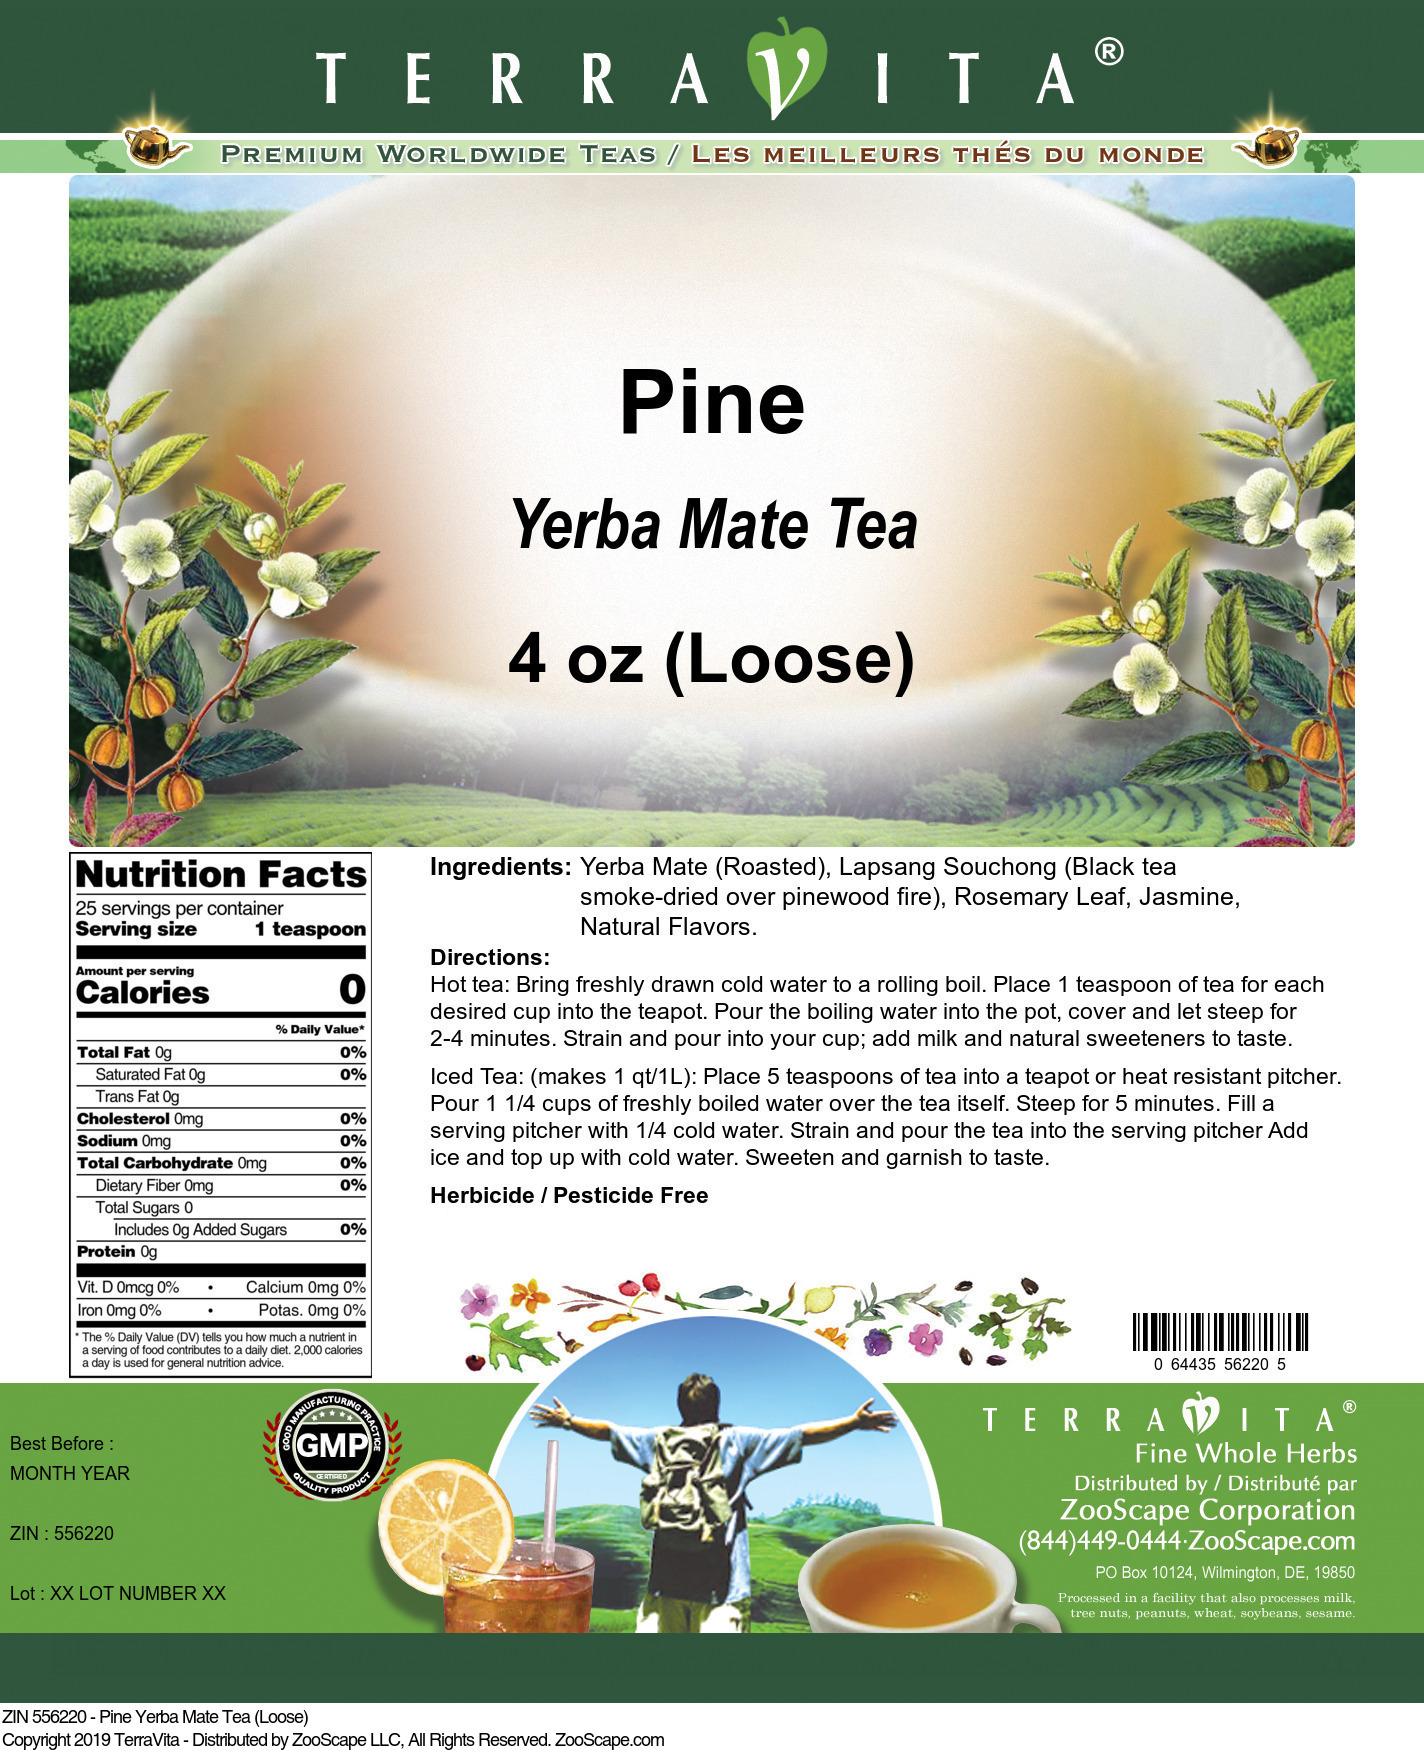 Pine Yerba Mate Tea (Loose)